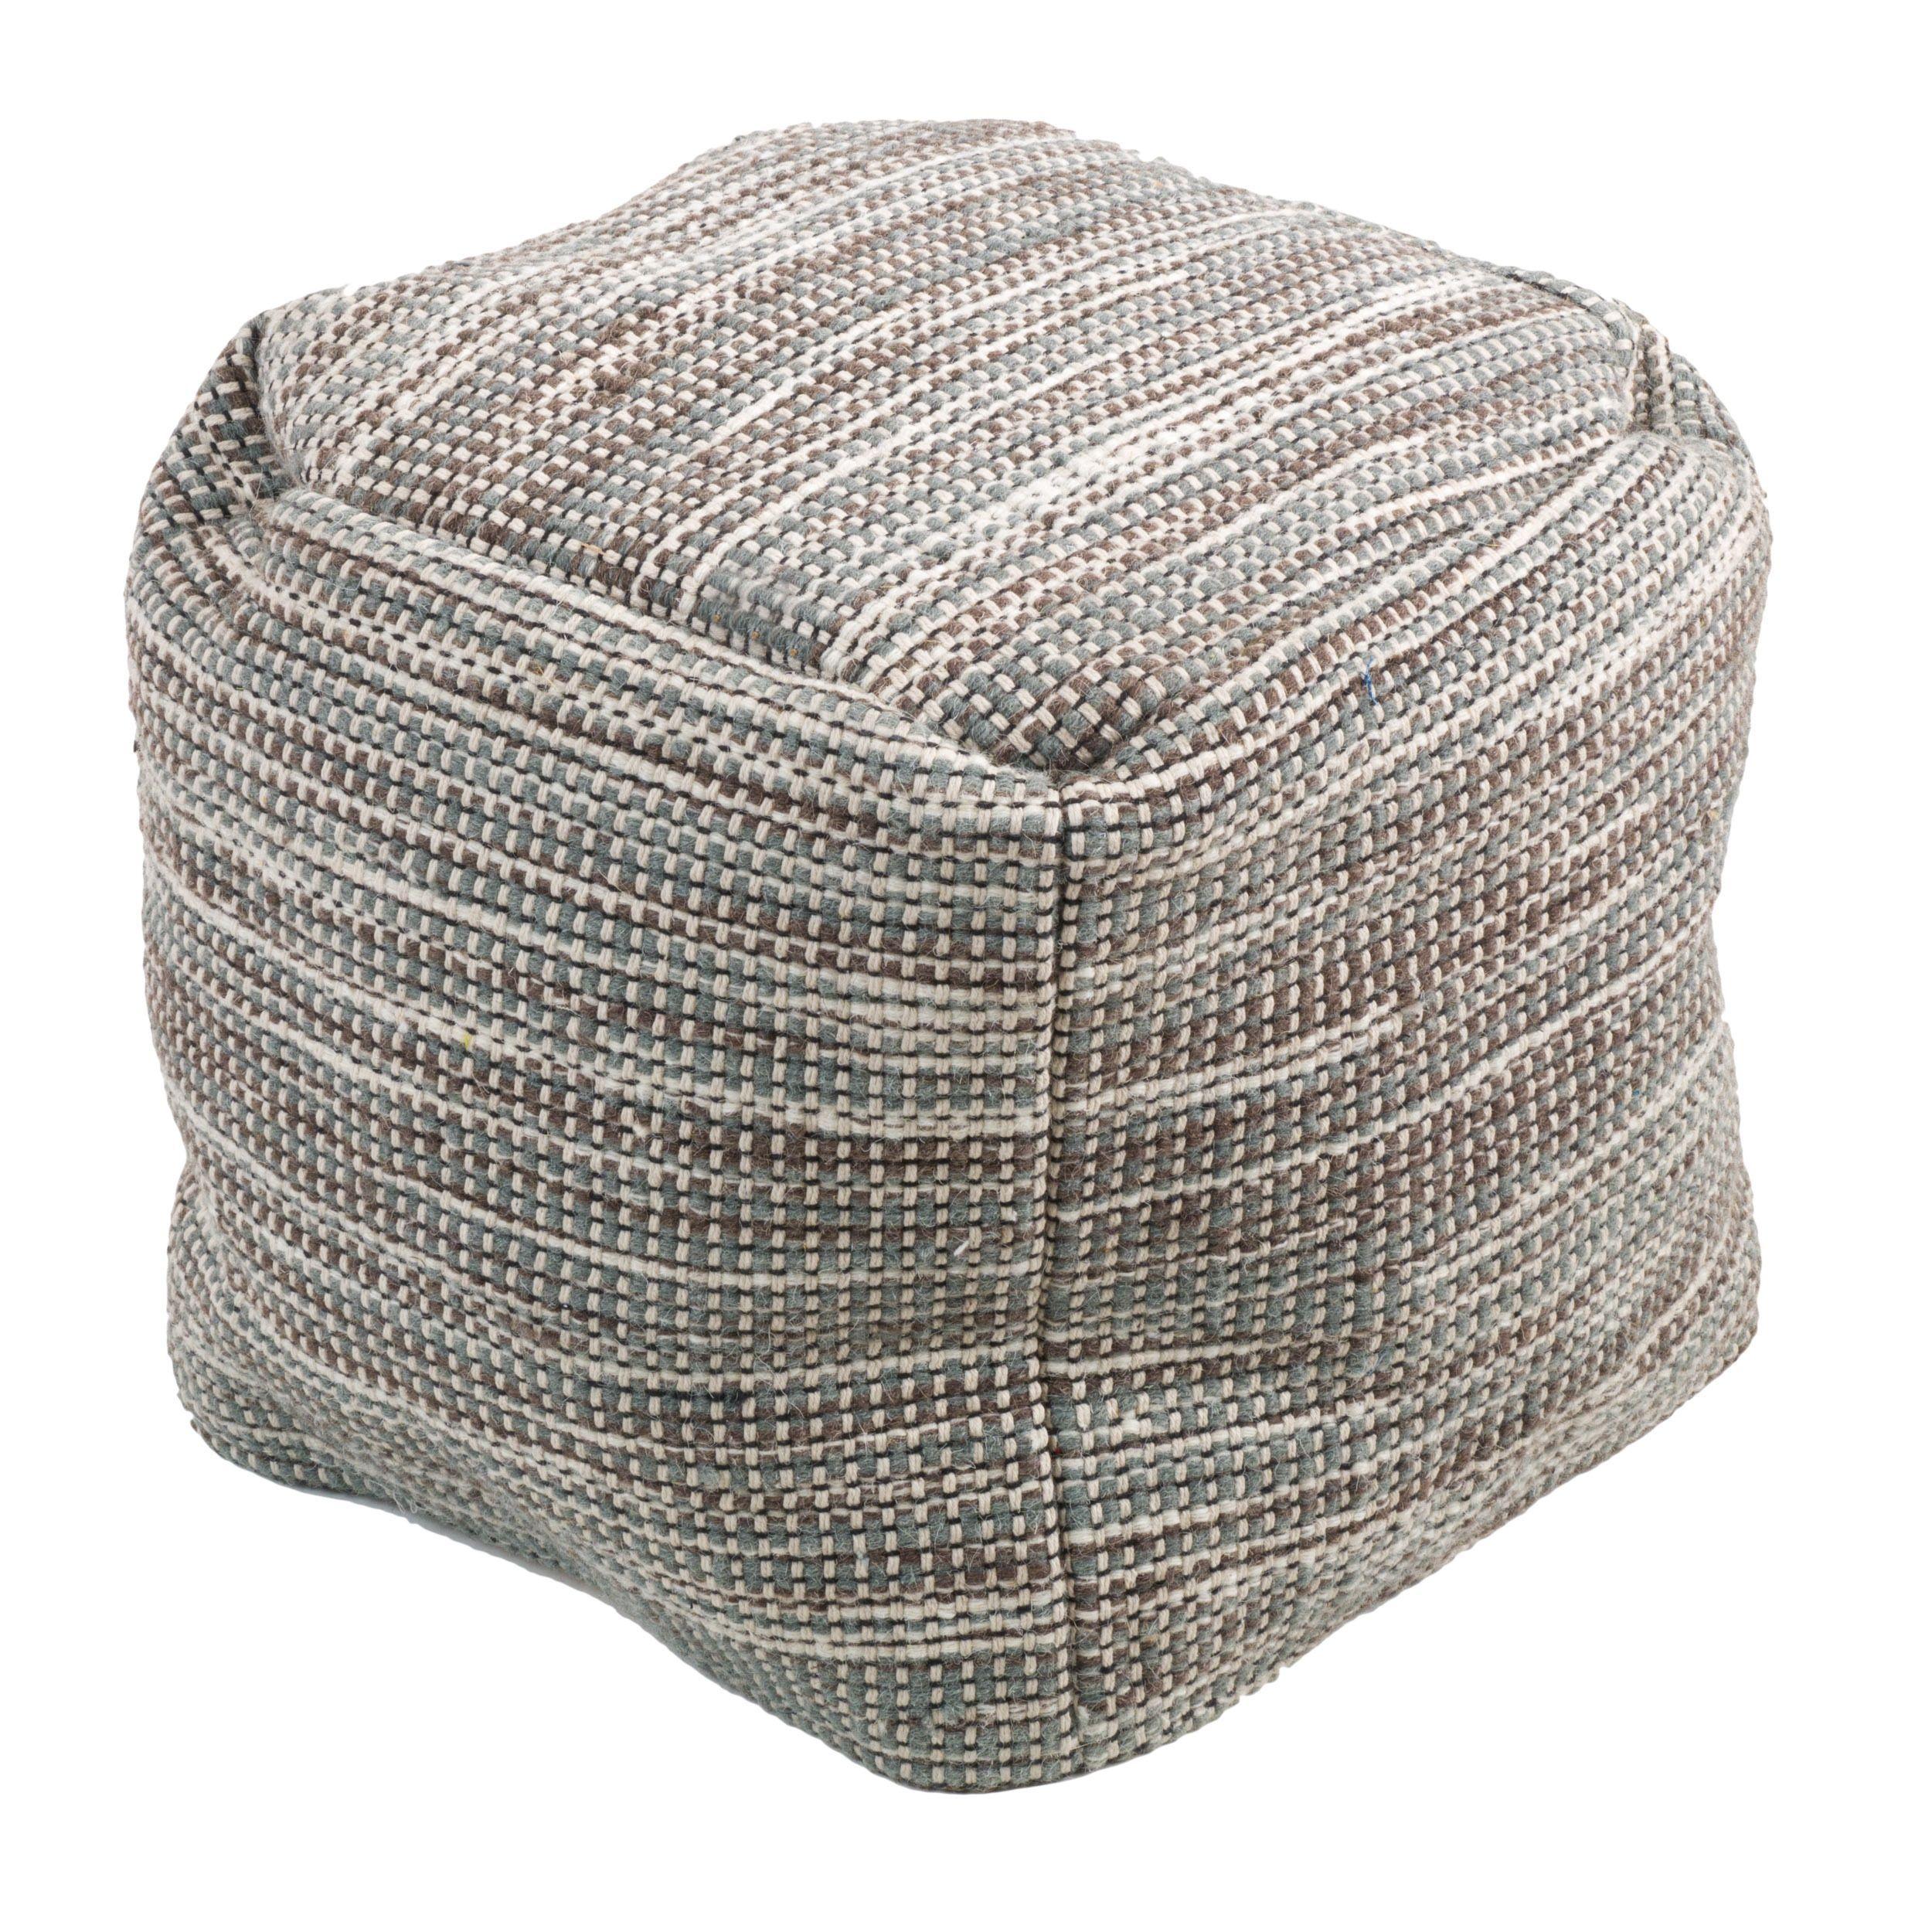 Christopher Knight Home Edon Wool Embroidery Pouf Ottoman (Grey), Size Small